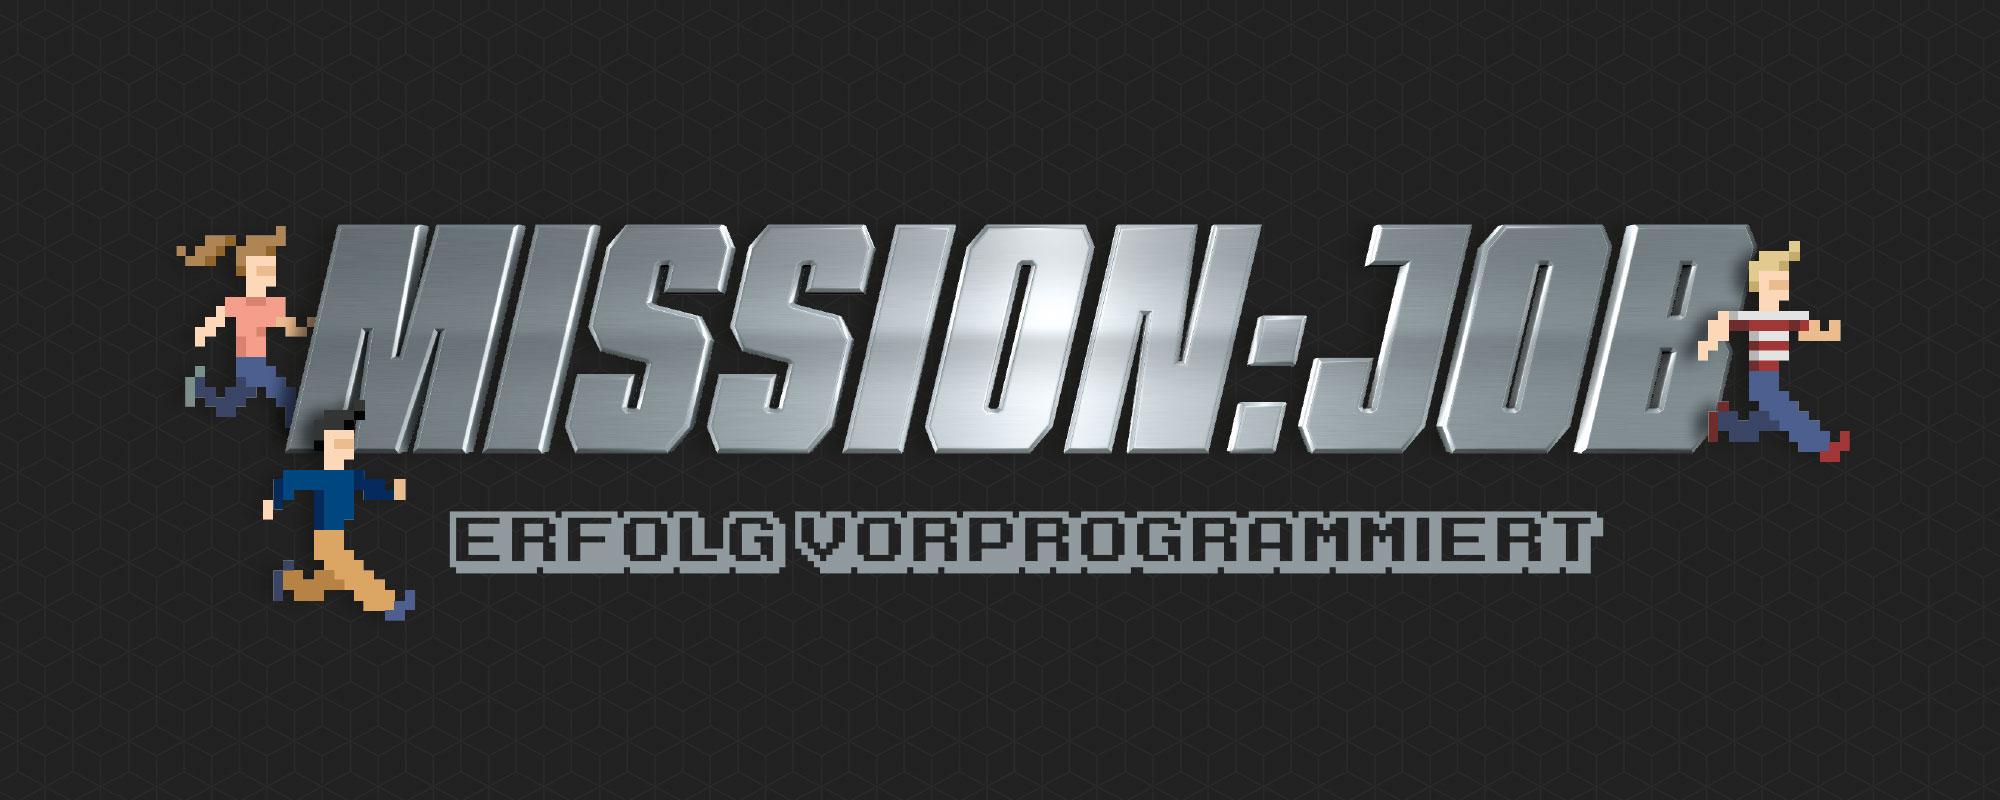 WKO_MJ2_Kampagne_Logo_01